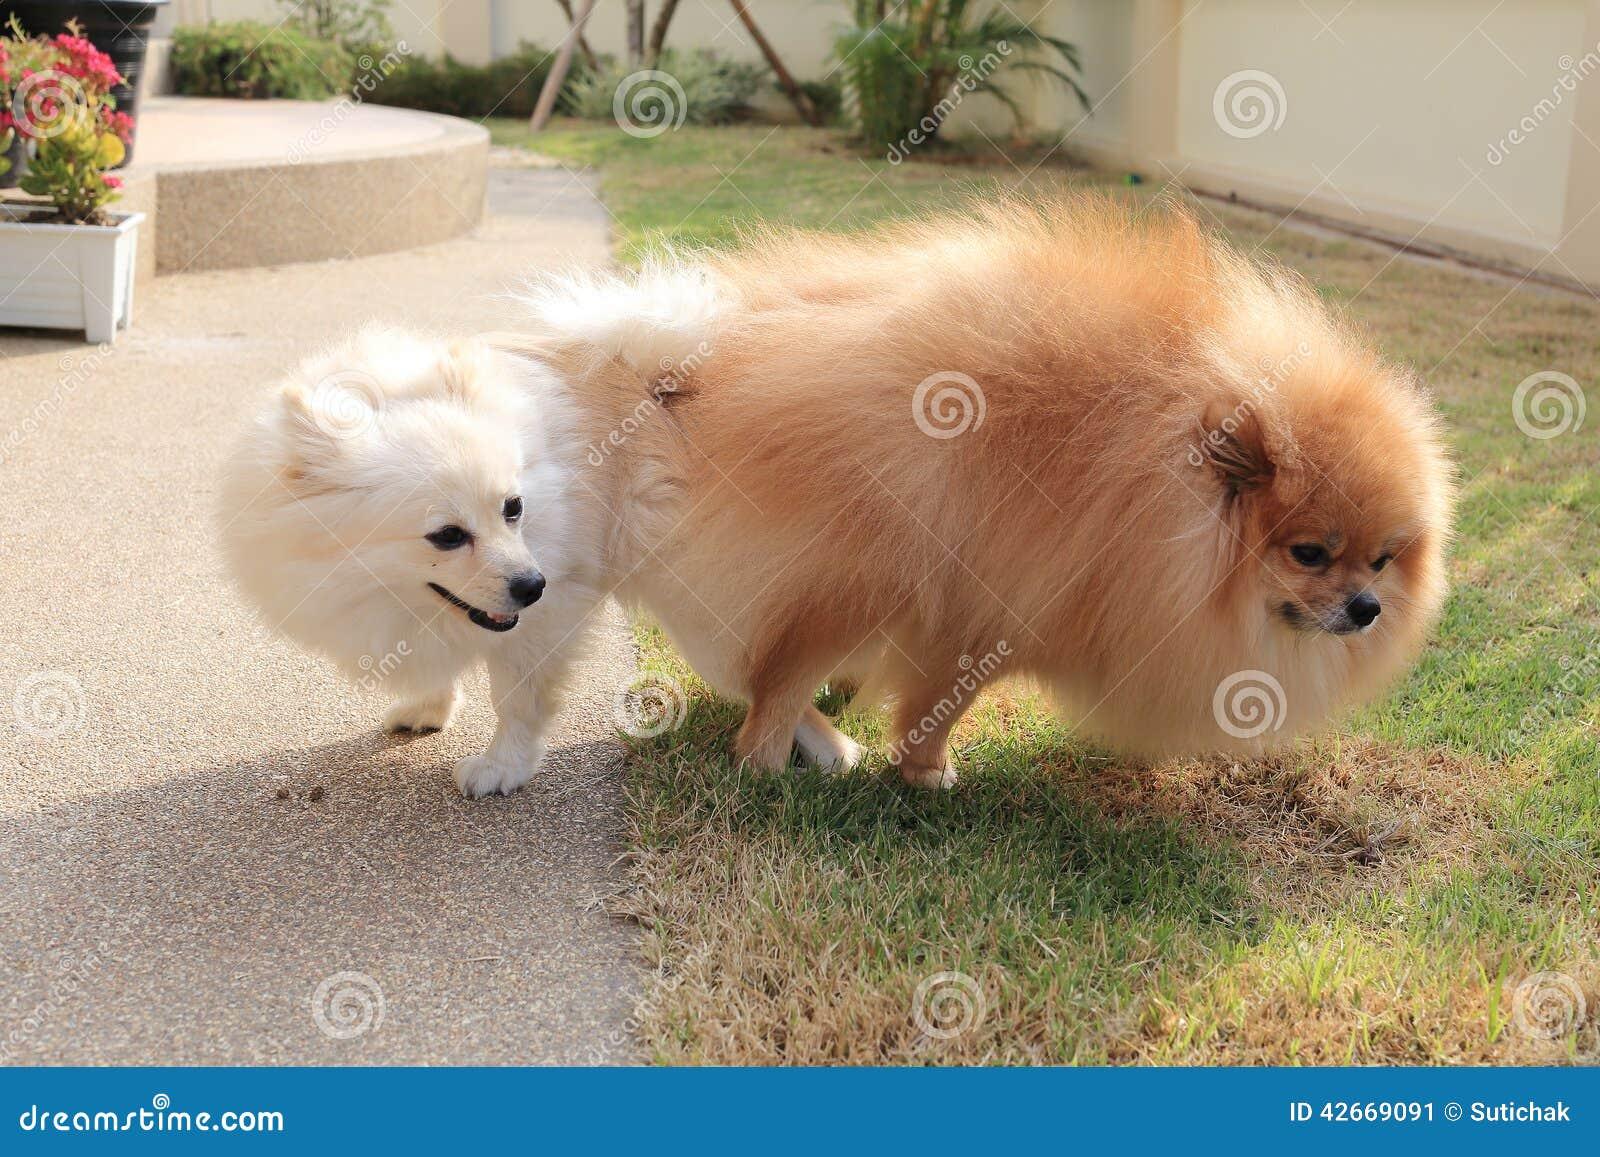 Pomeranian Dogs Mating Stock Photo 42669091 Megapixl